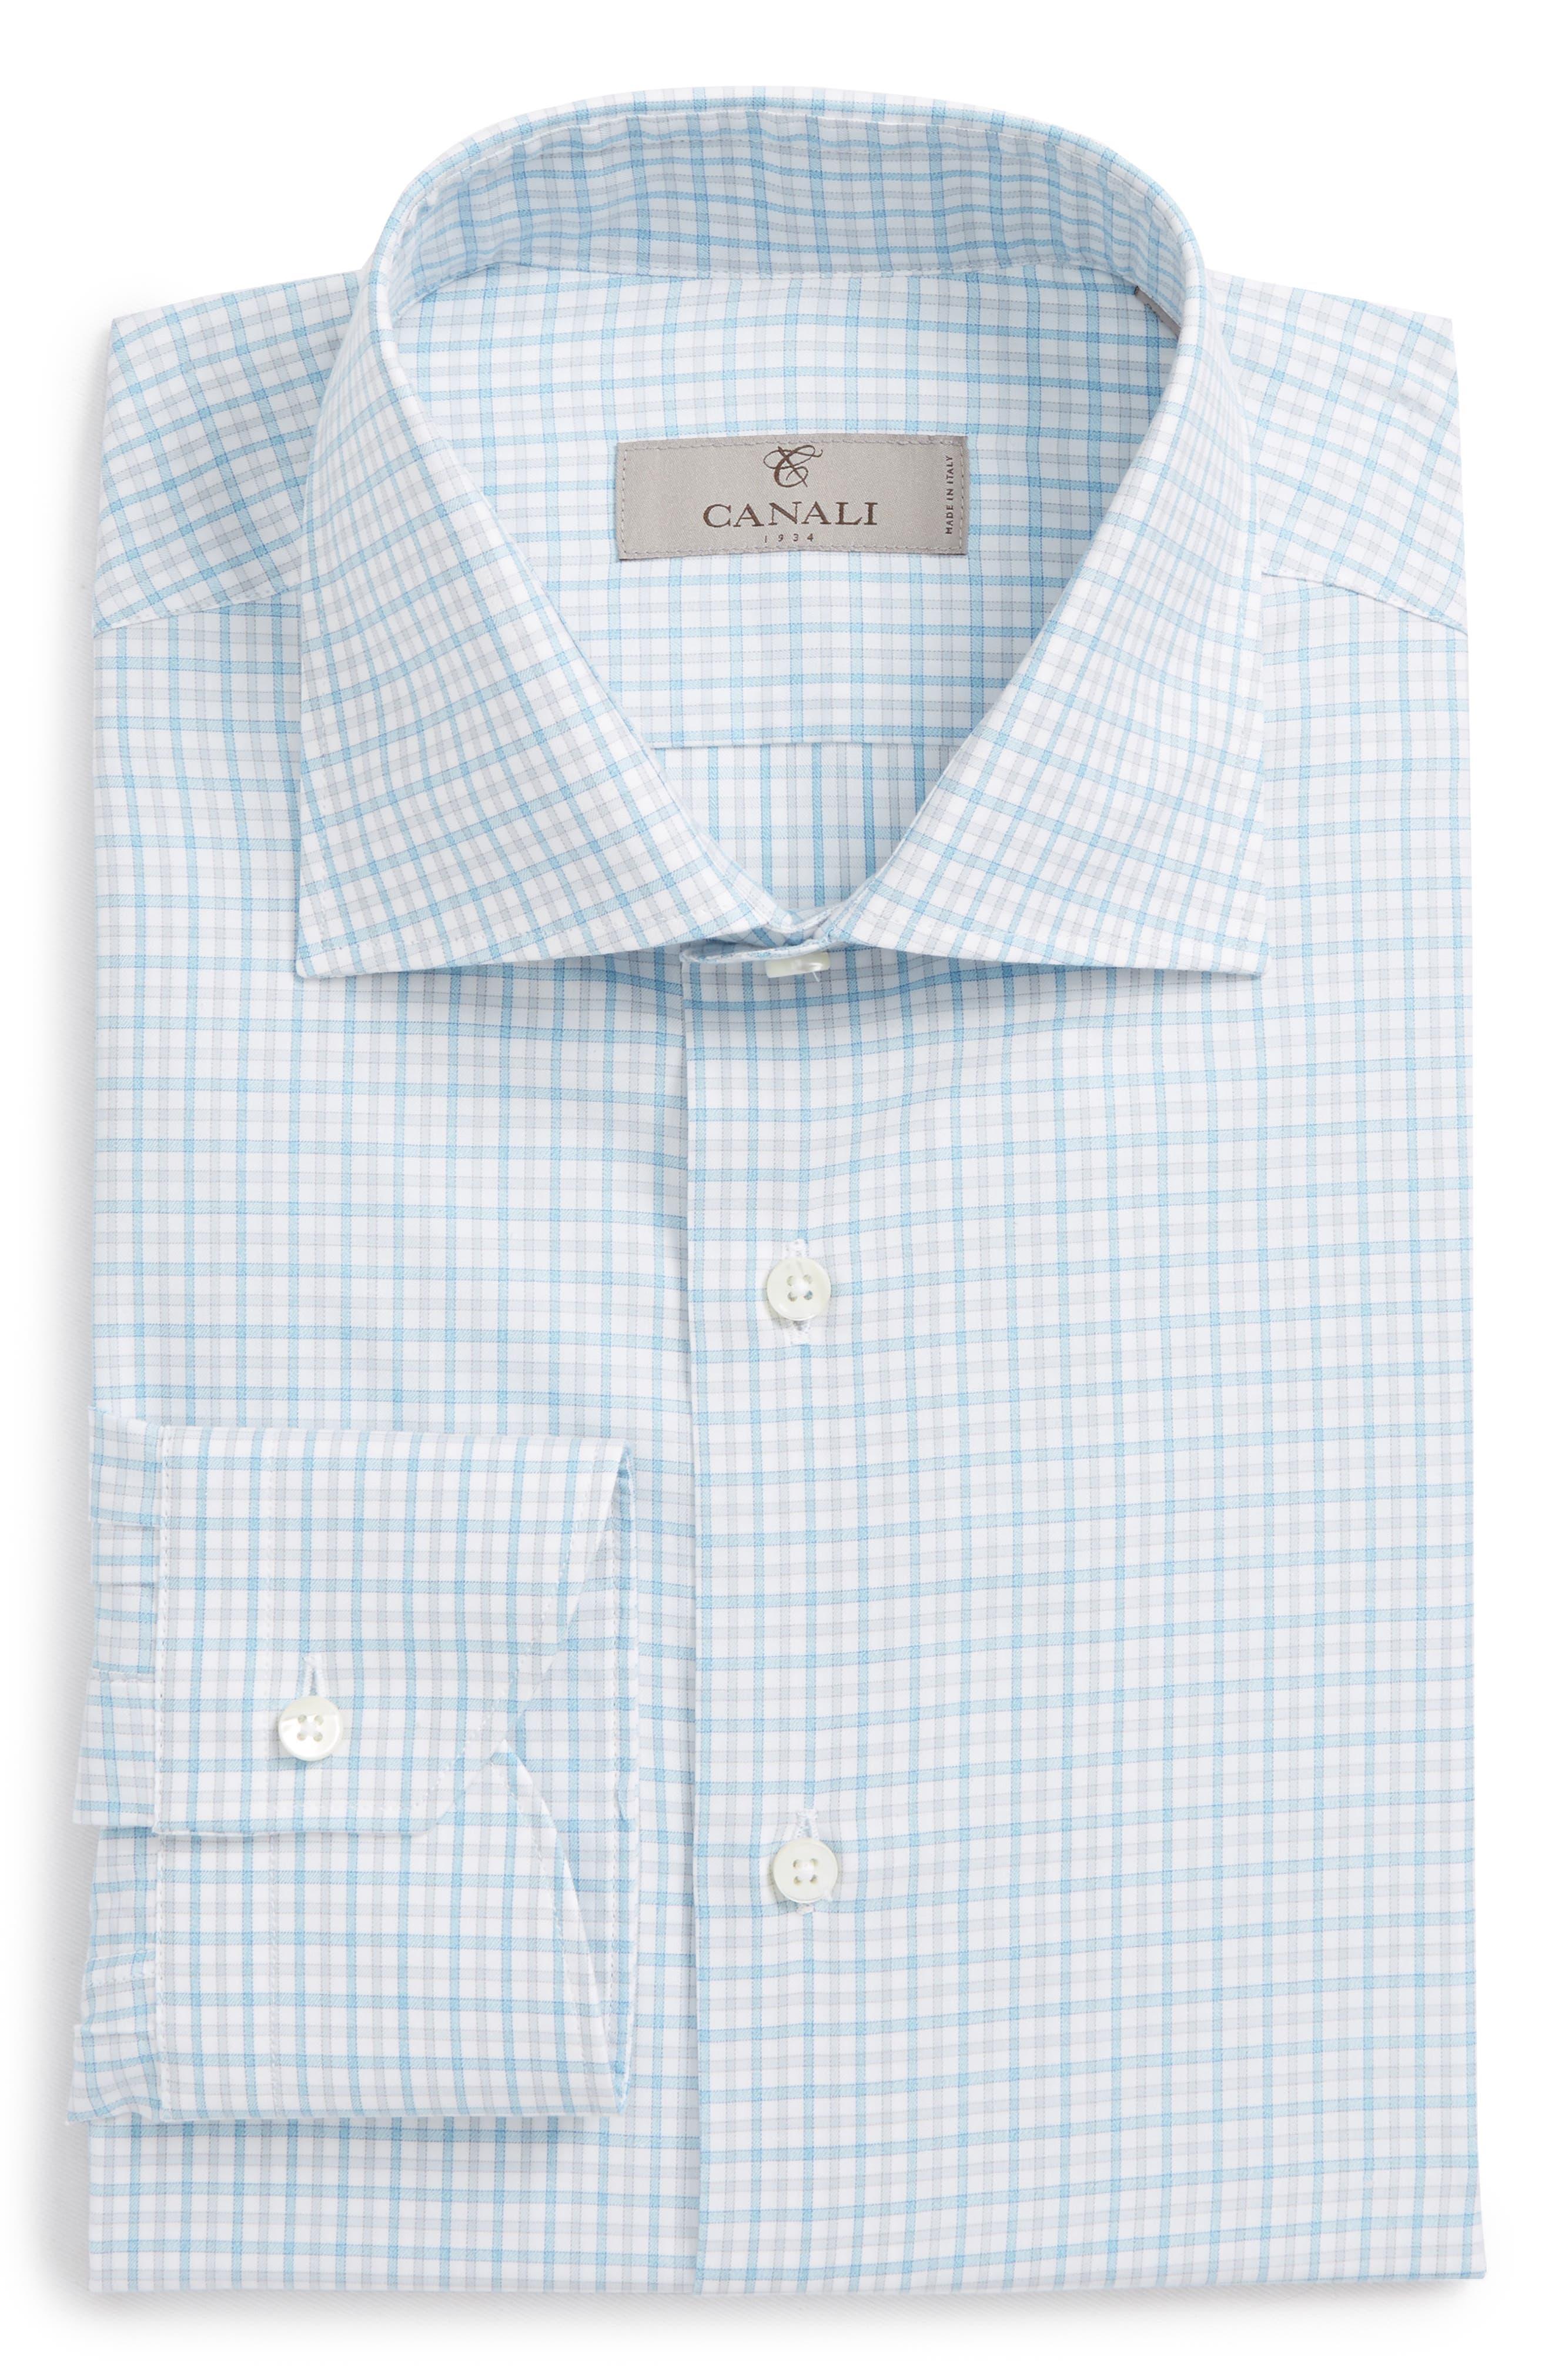 Regular Fit Check Dress Shirt,                             Alternate thumbnail 6, color,                             Turquoise